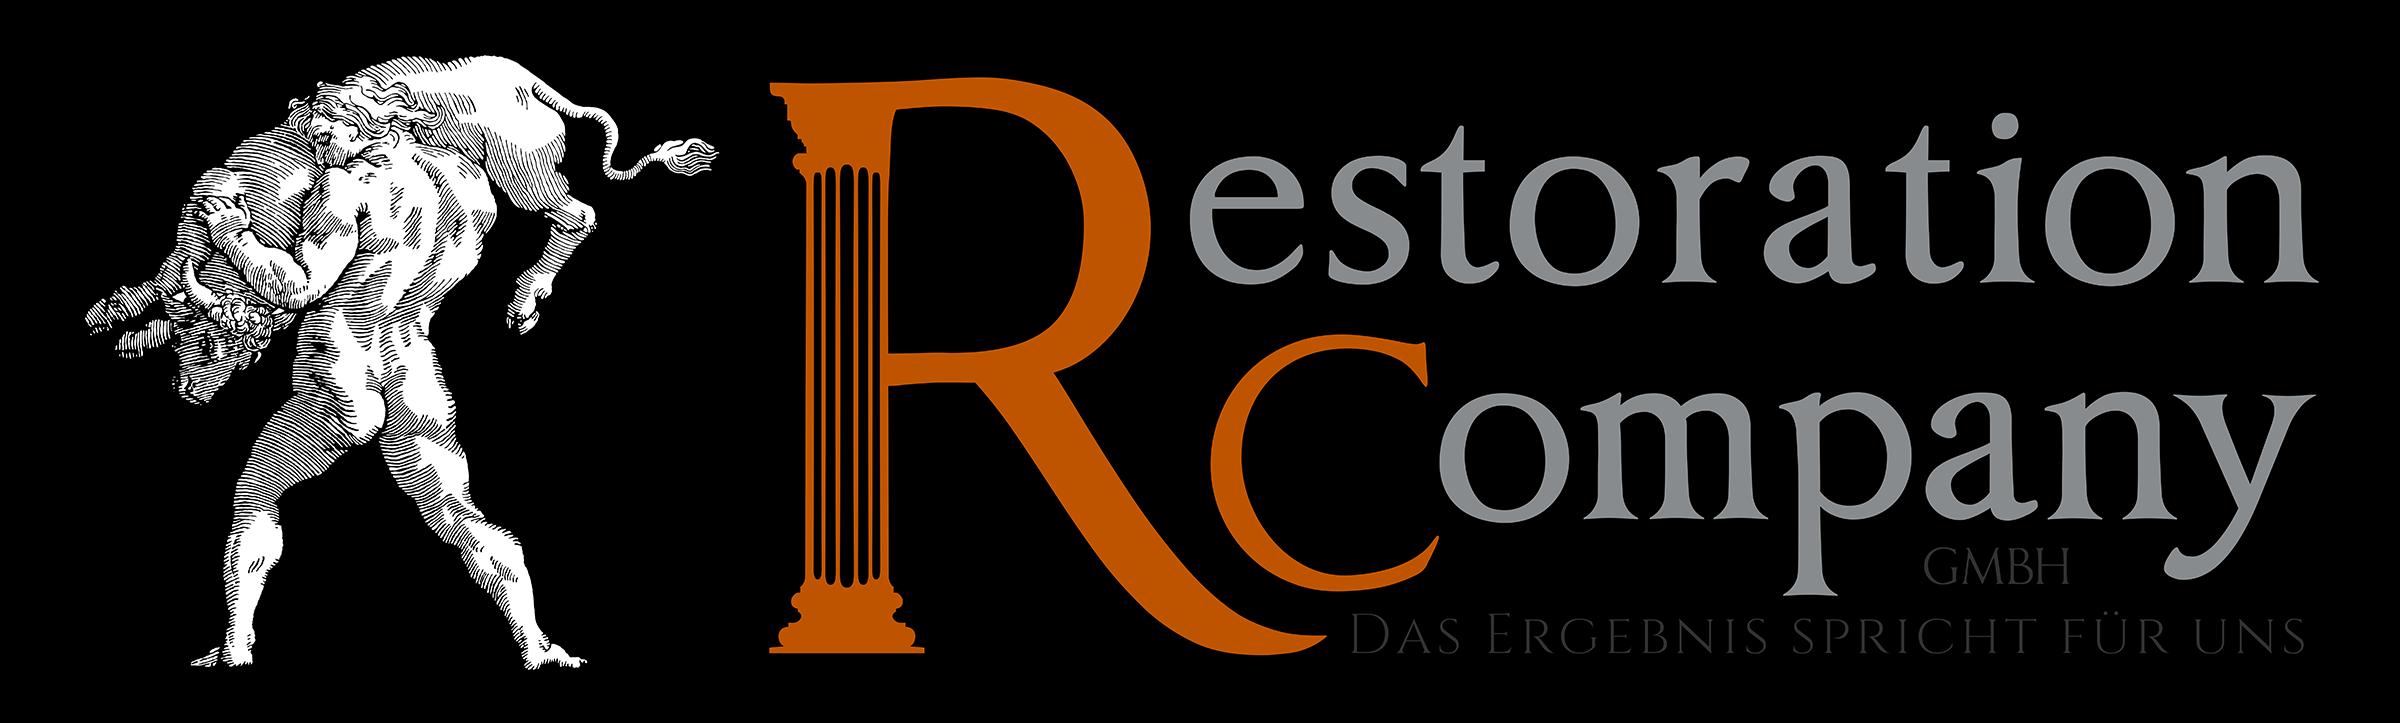 Restoration Company GmbH